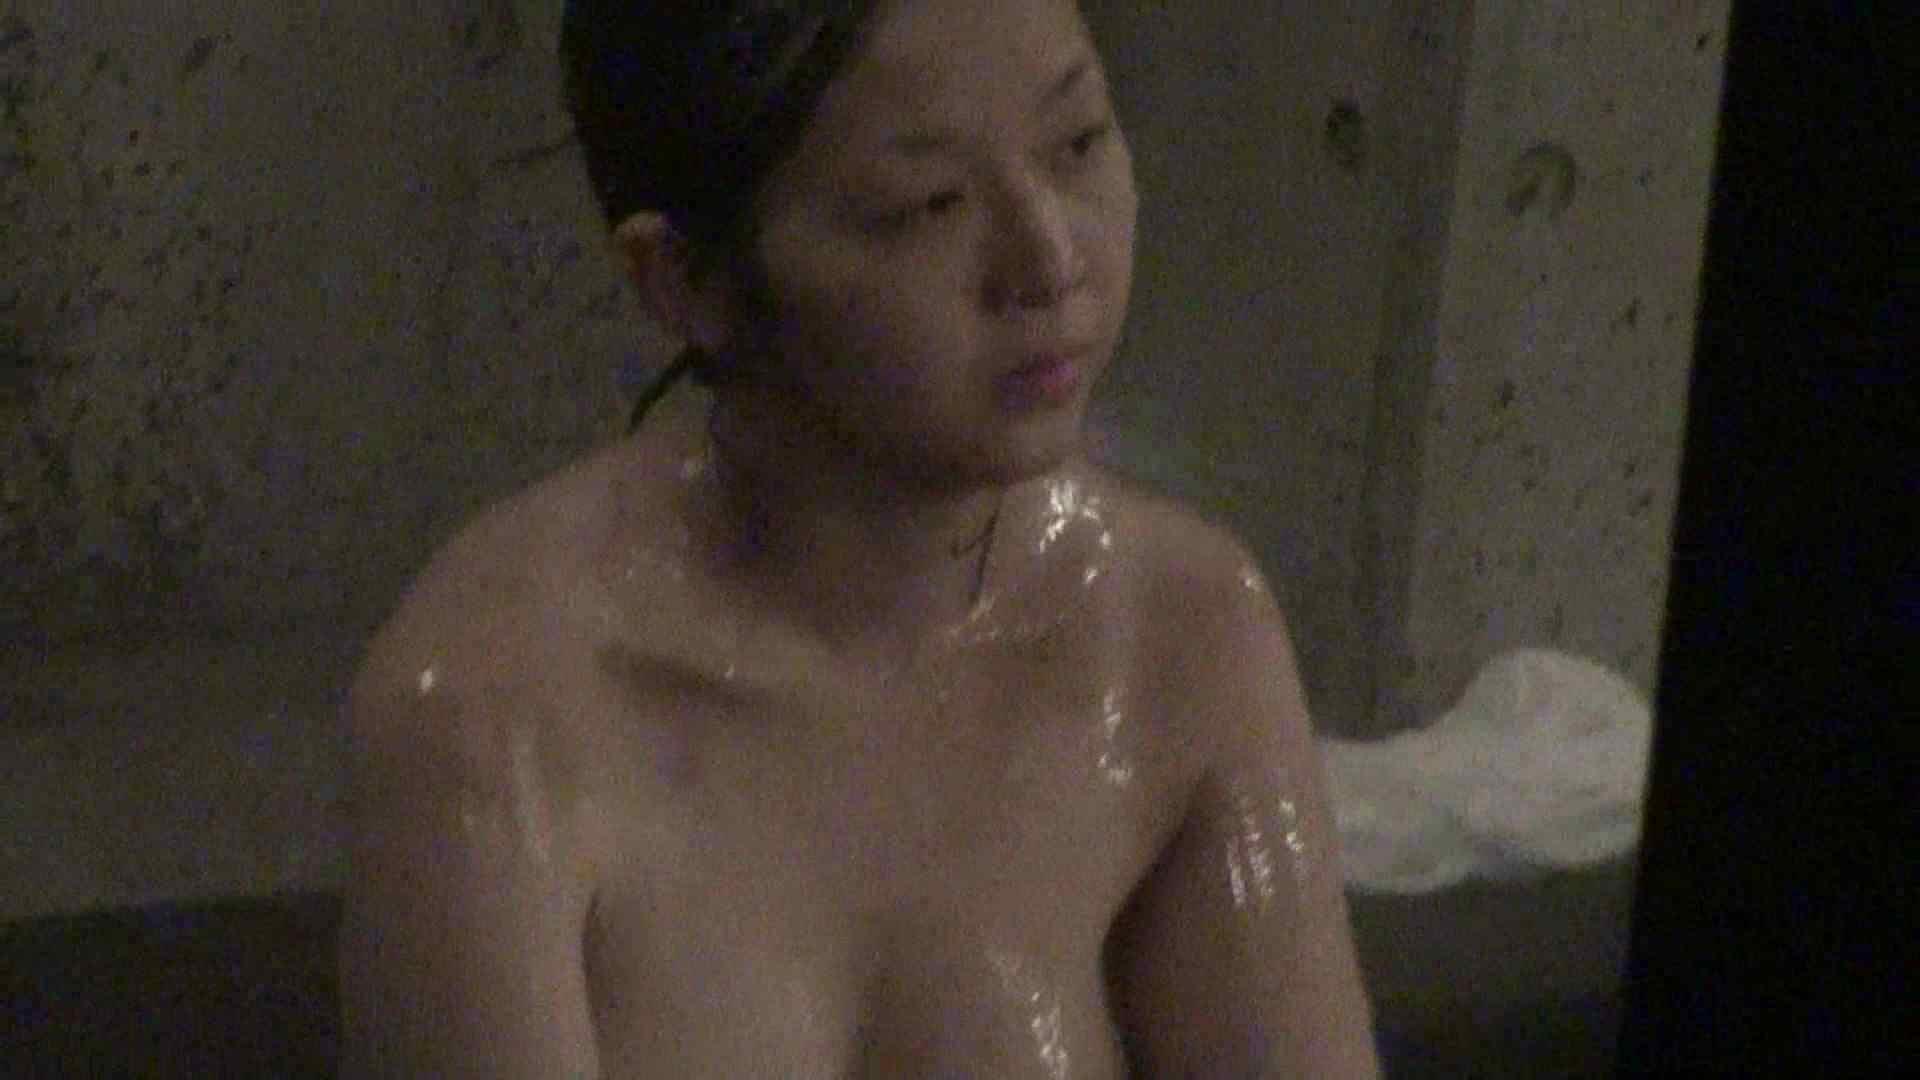 Aquaな露天風呂Vol.328 エロいOL   0  80枚